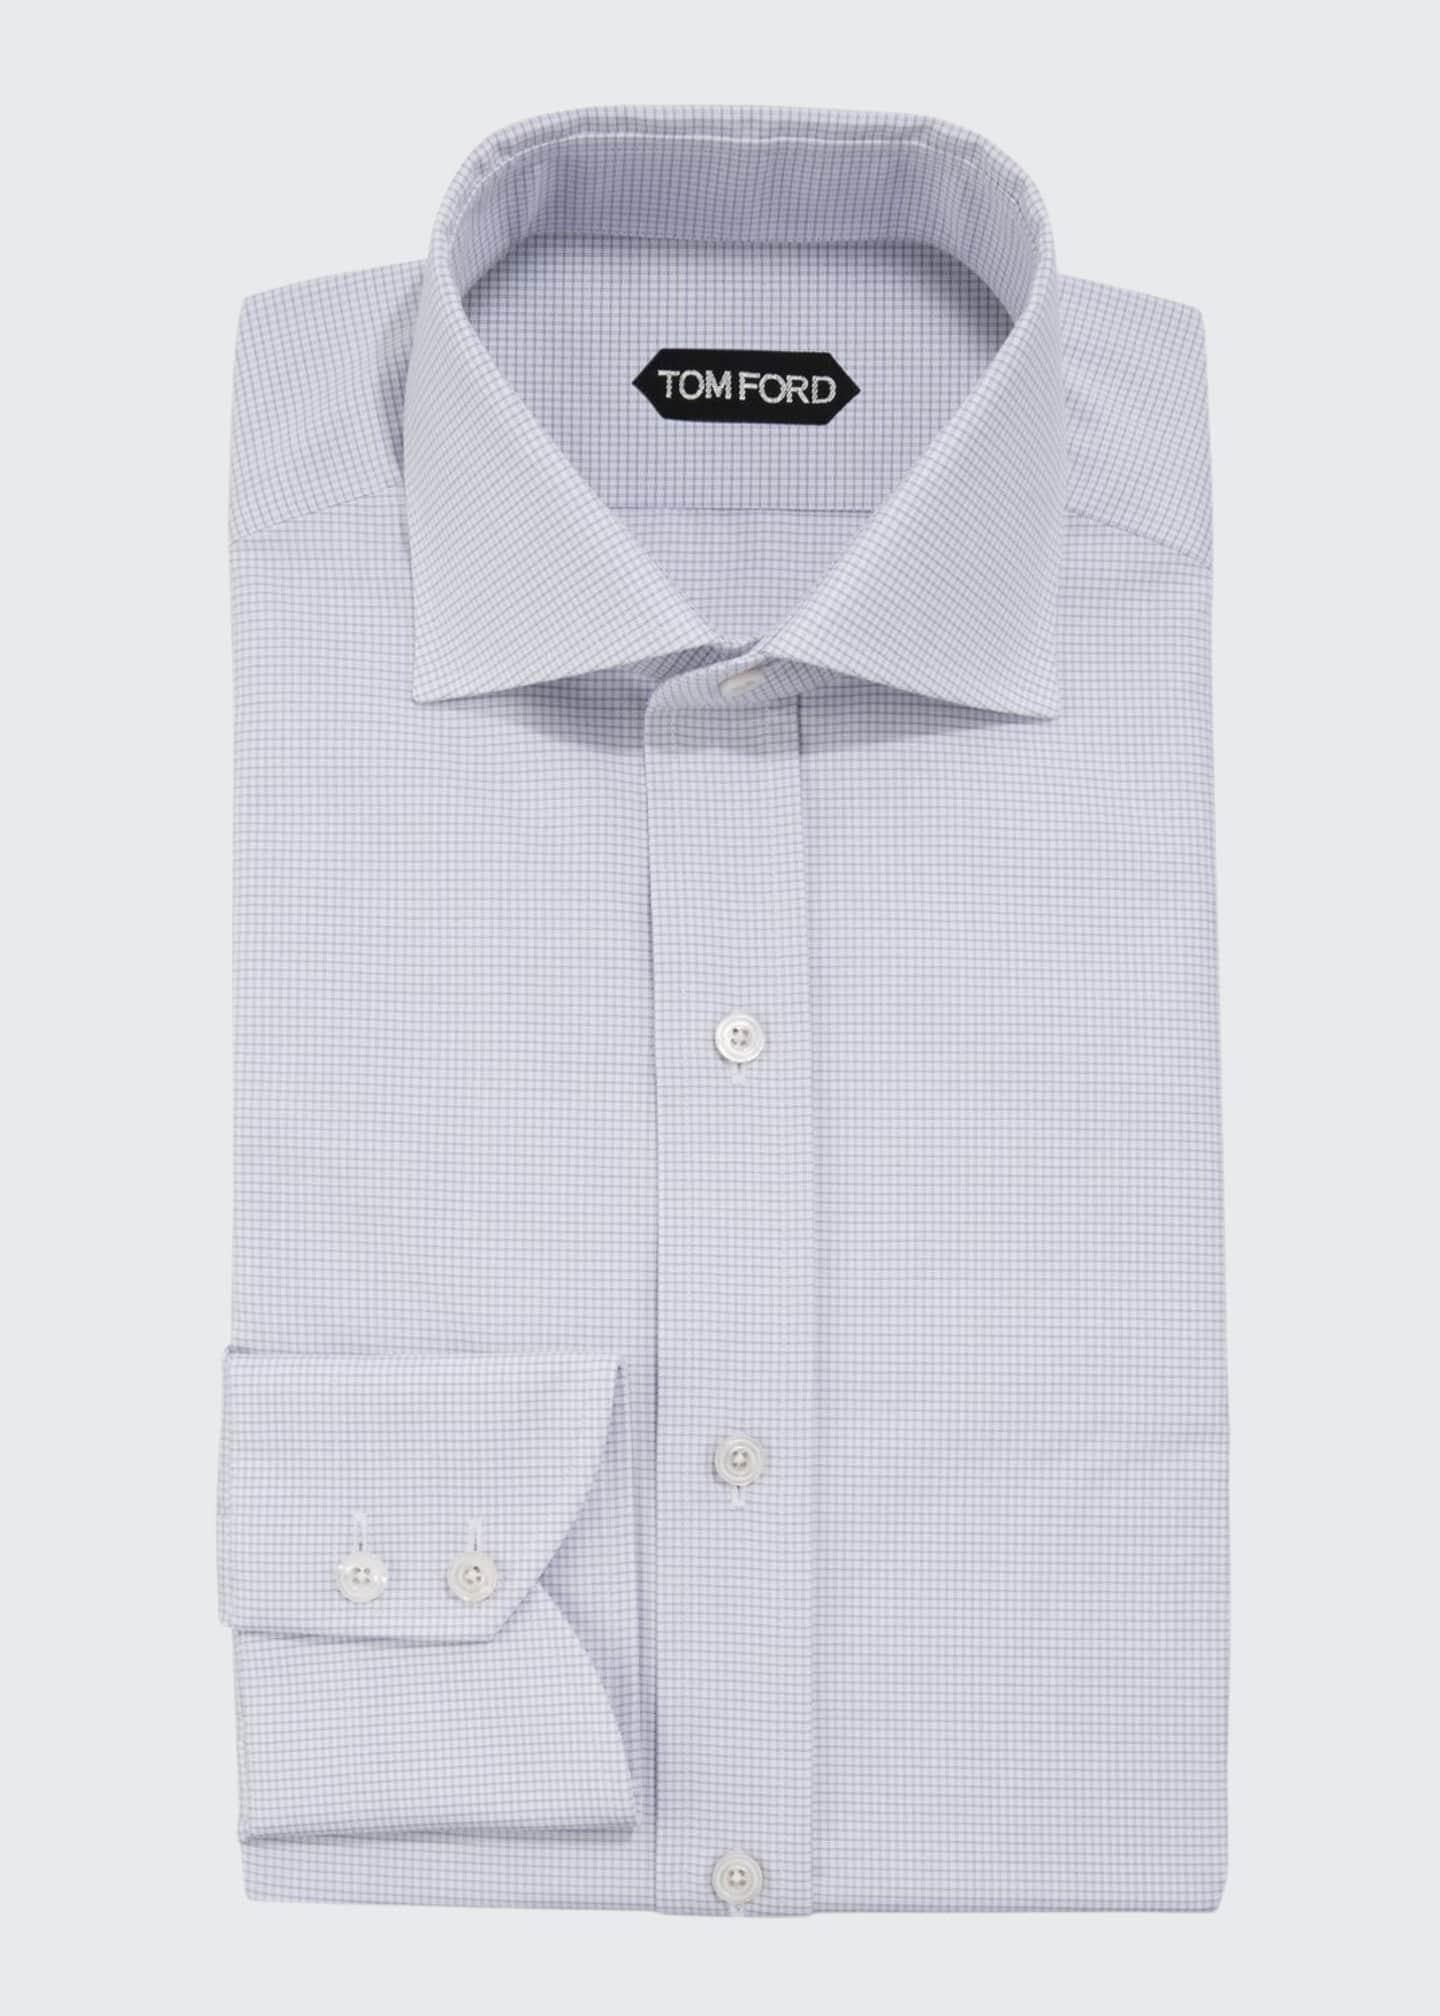 TOM FORD Men's Micro-Check Dress Shirt